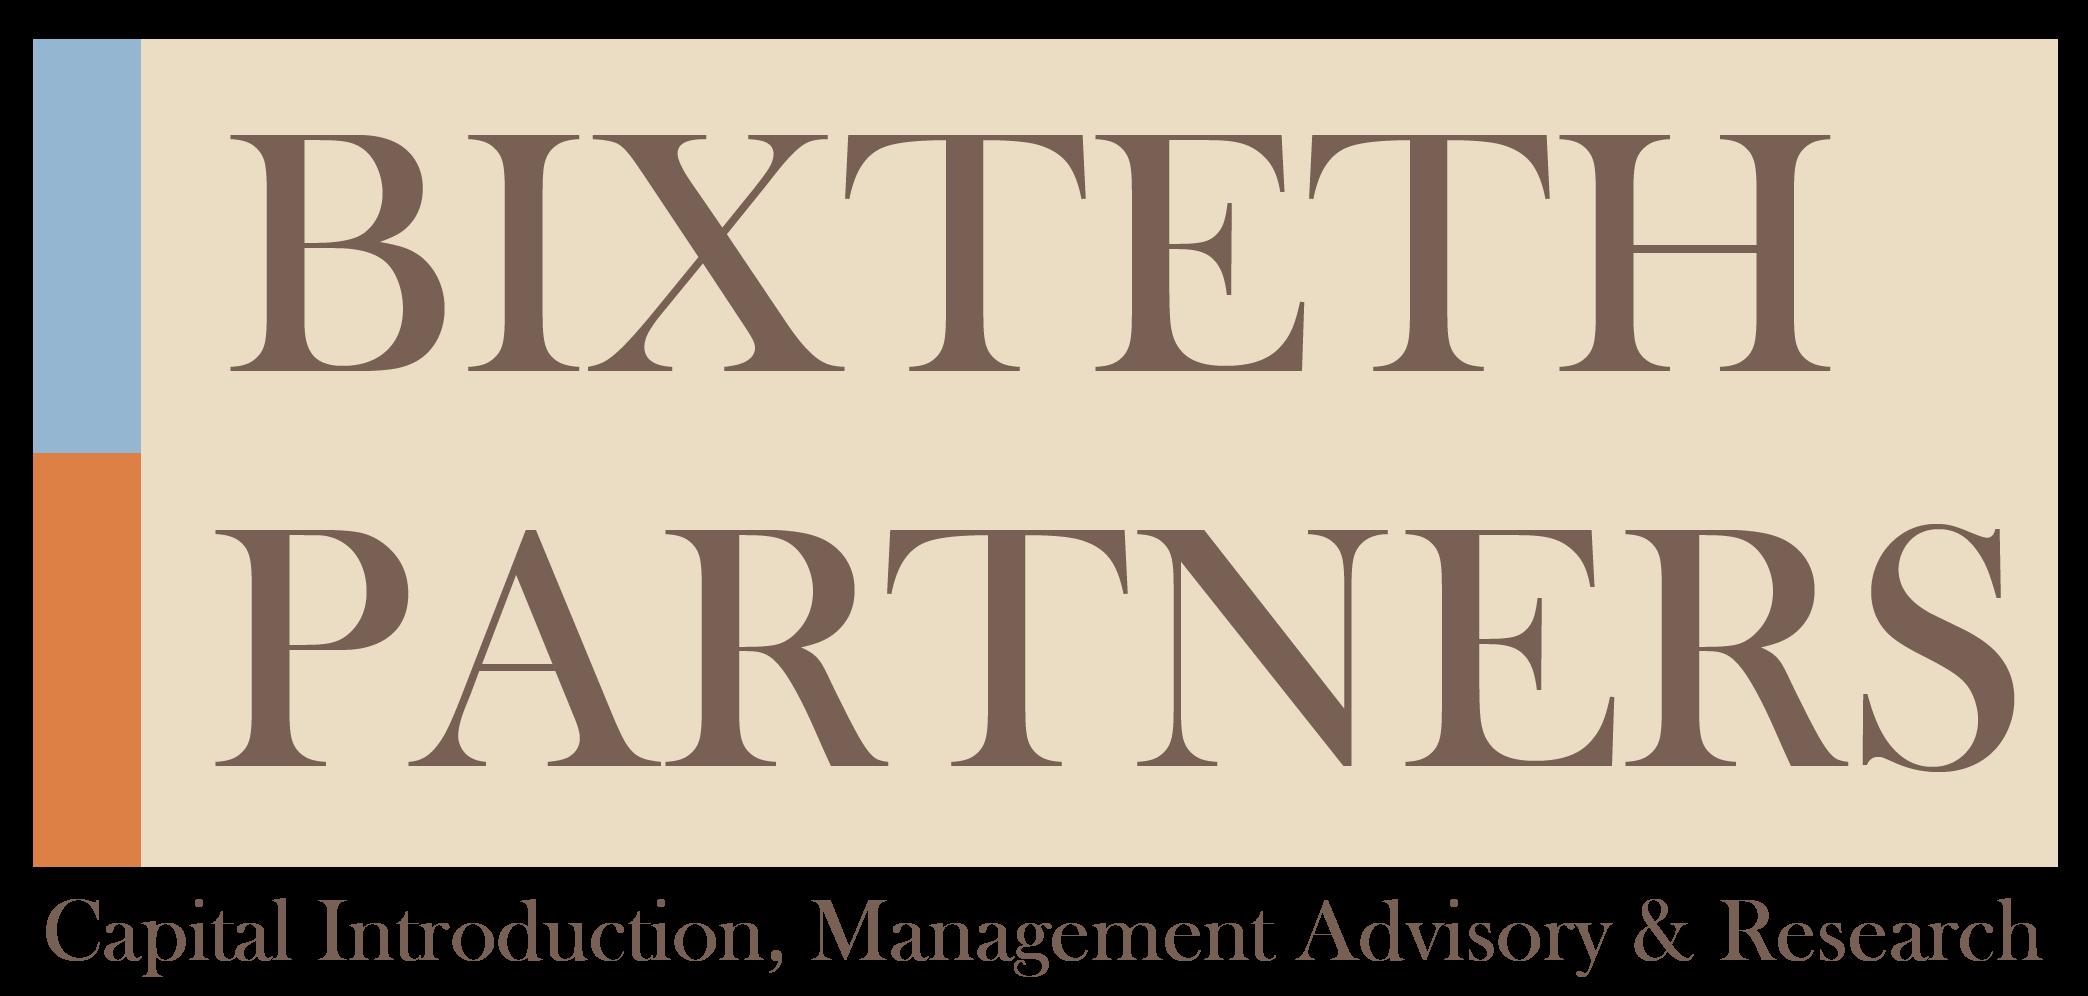 Bixteth Partners